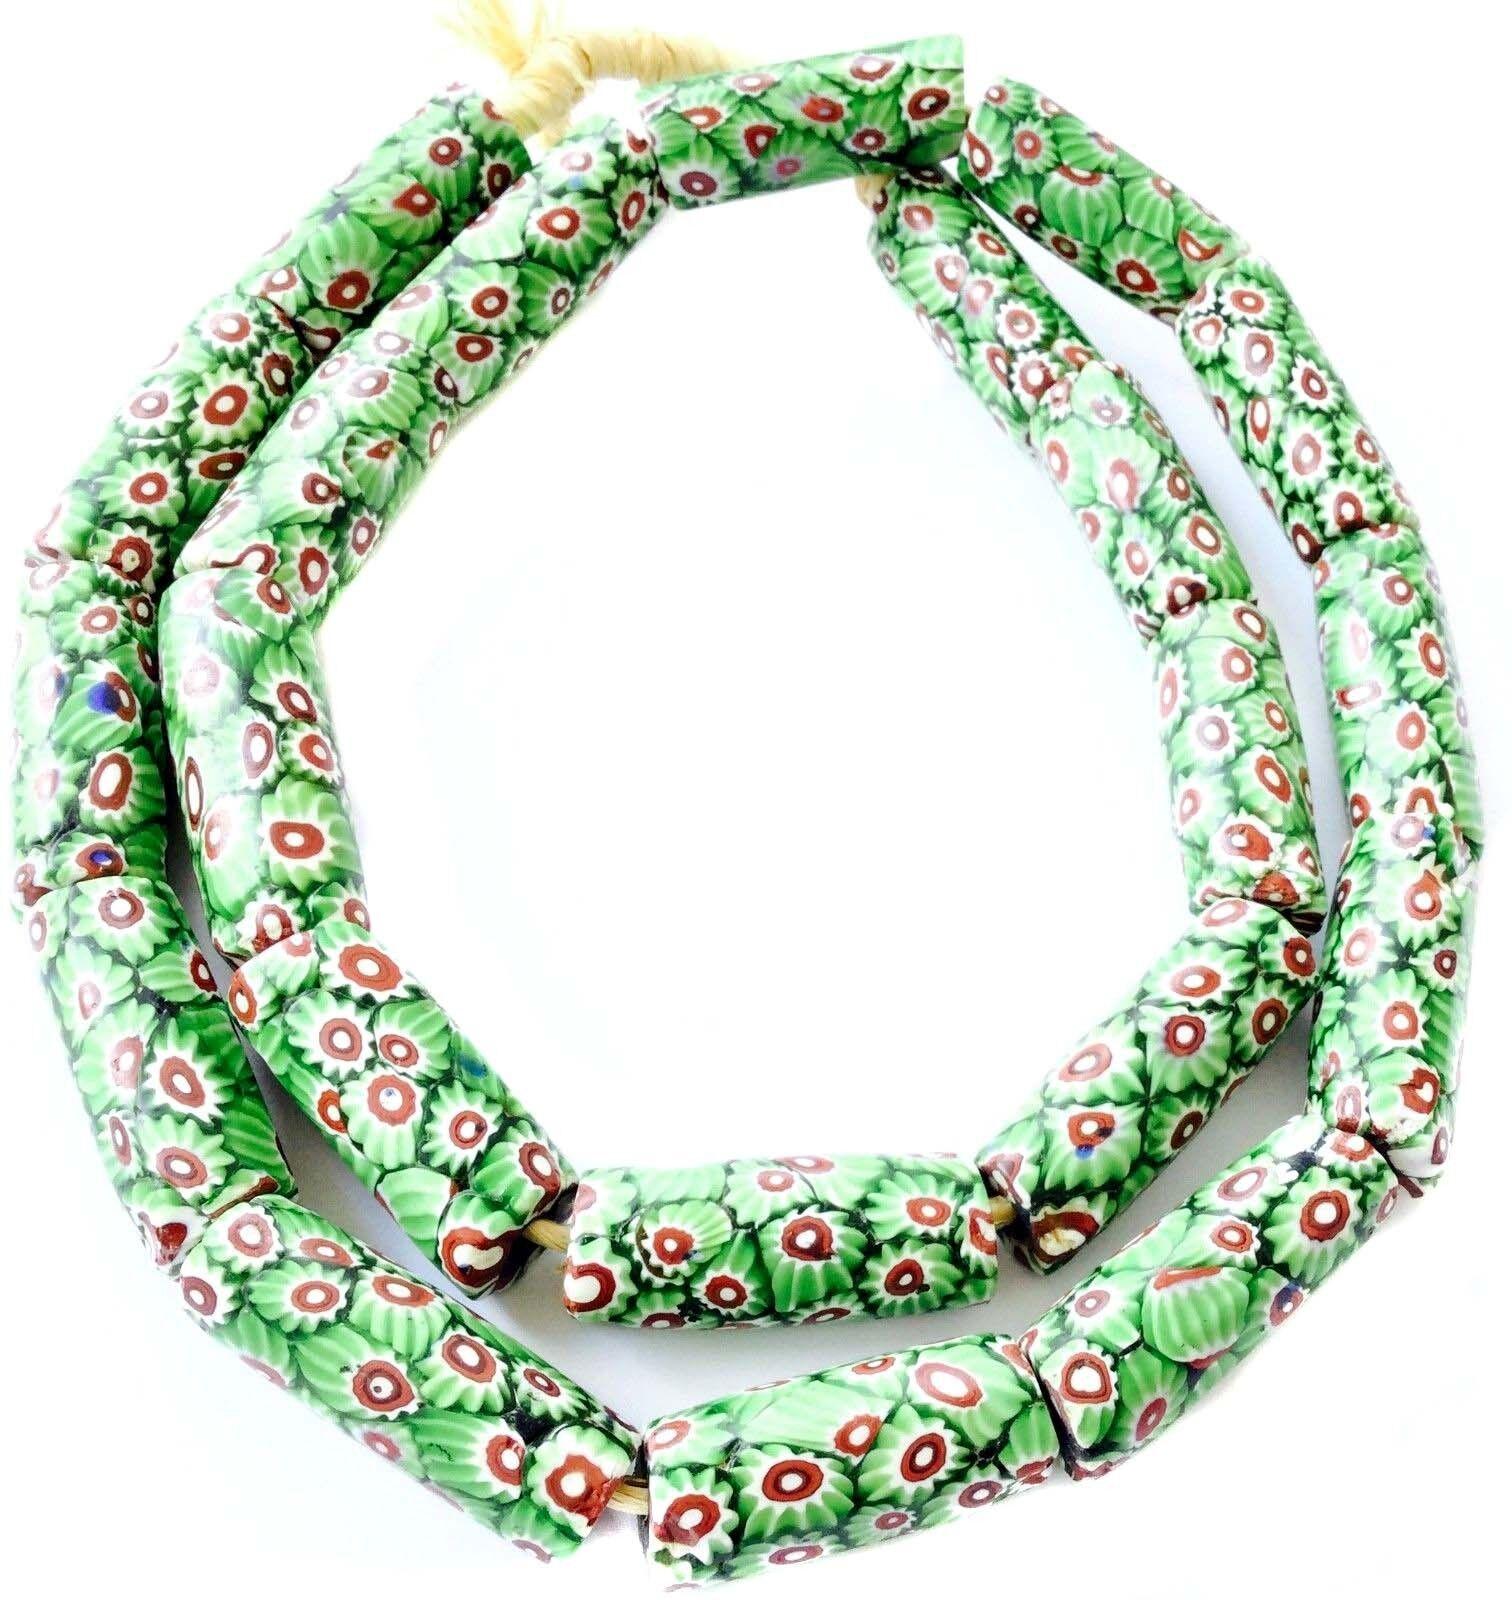 Rare Antique Venetian Green Chevron Cane Cylinder glass African trade beads